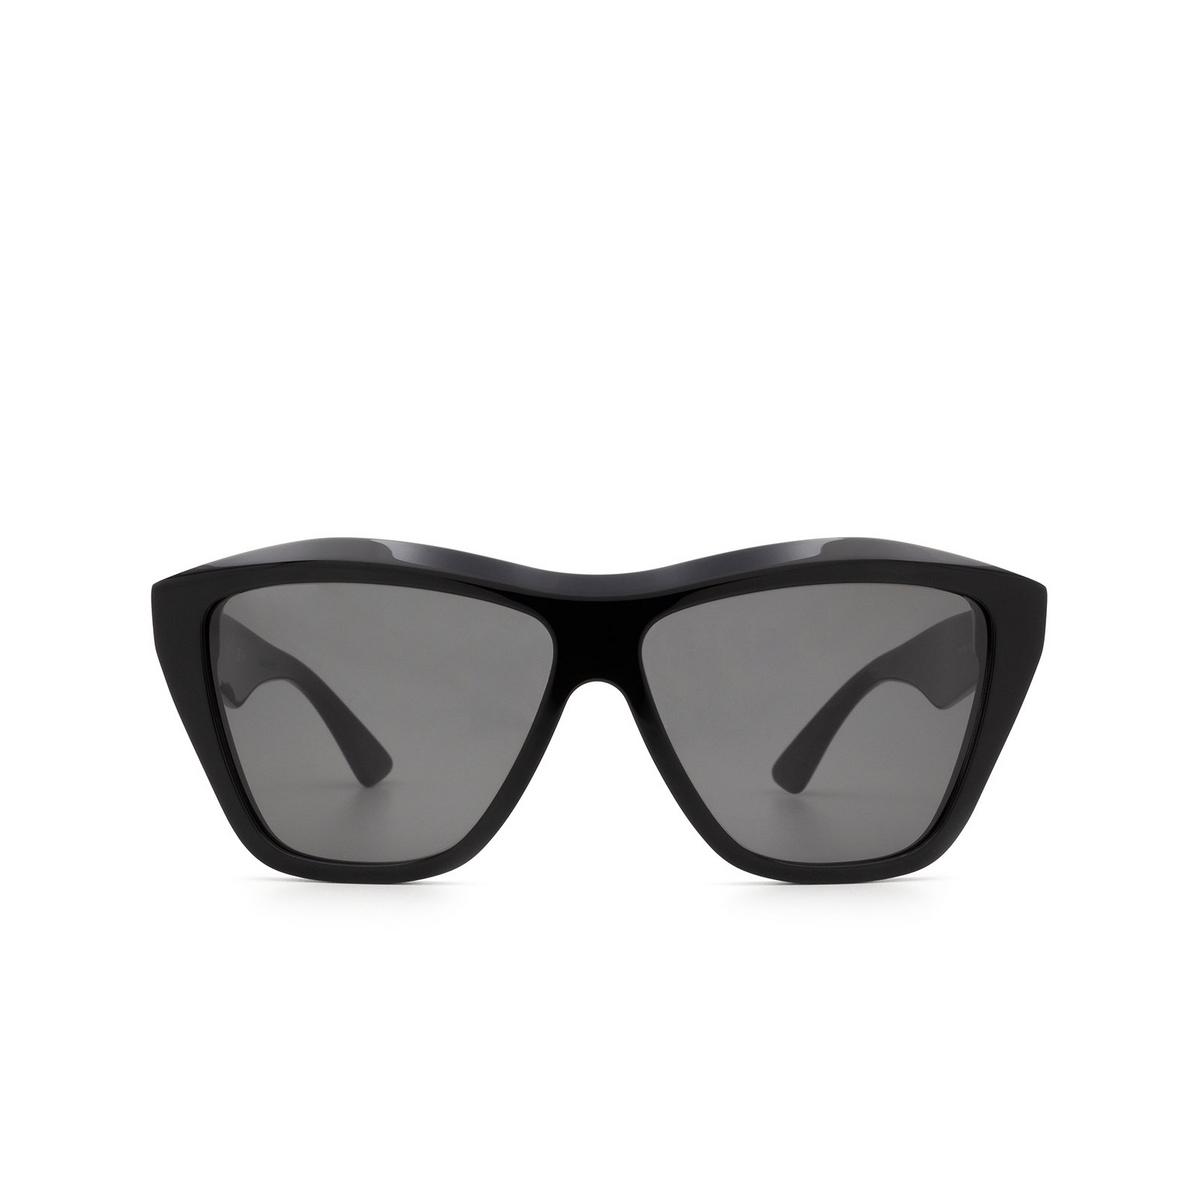 Bottega Veneta® Square Sunglasses: BV1092S color Black 001 - front view.